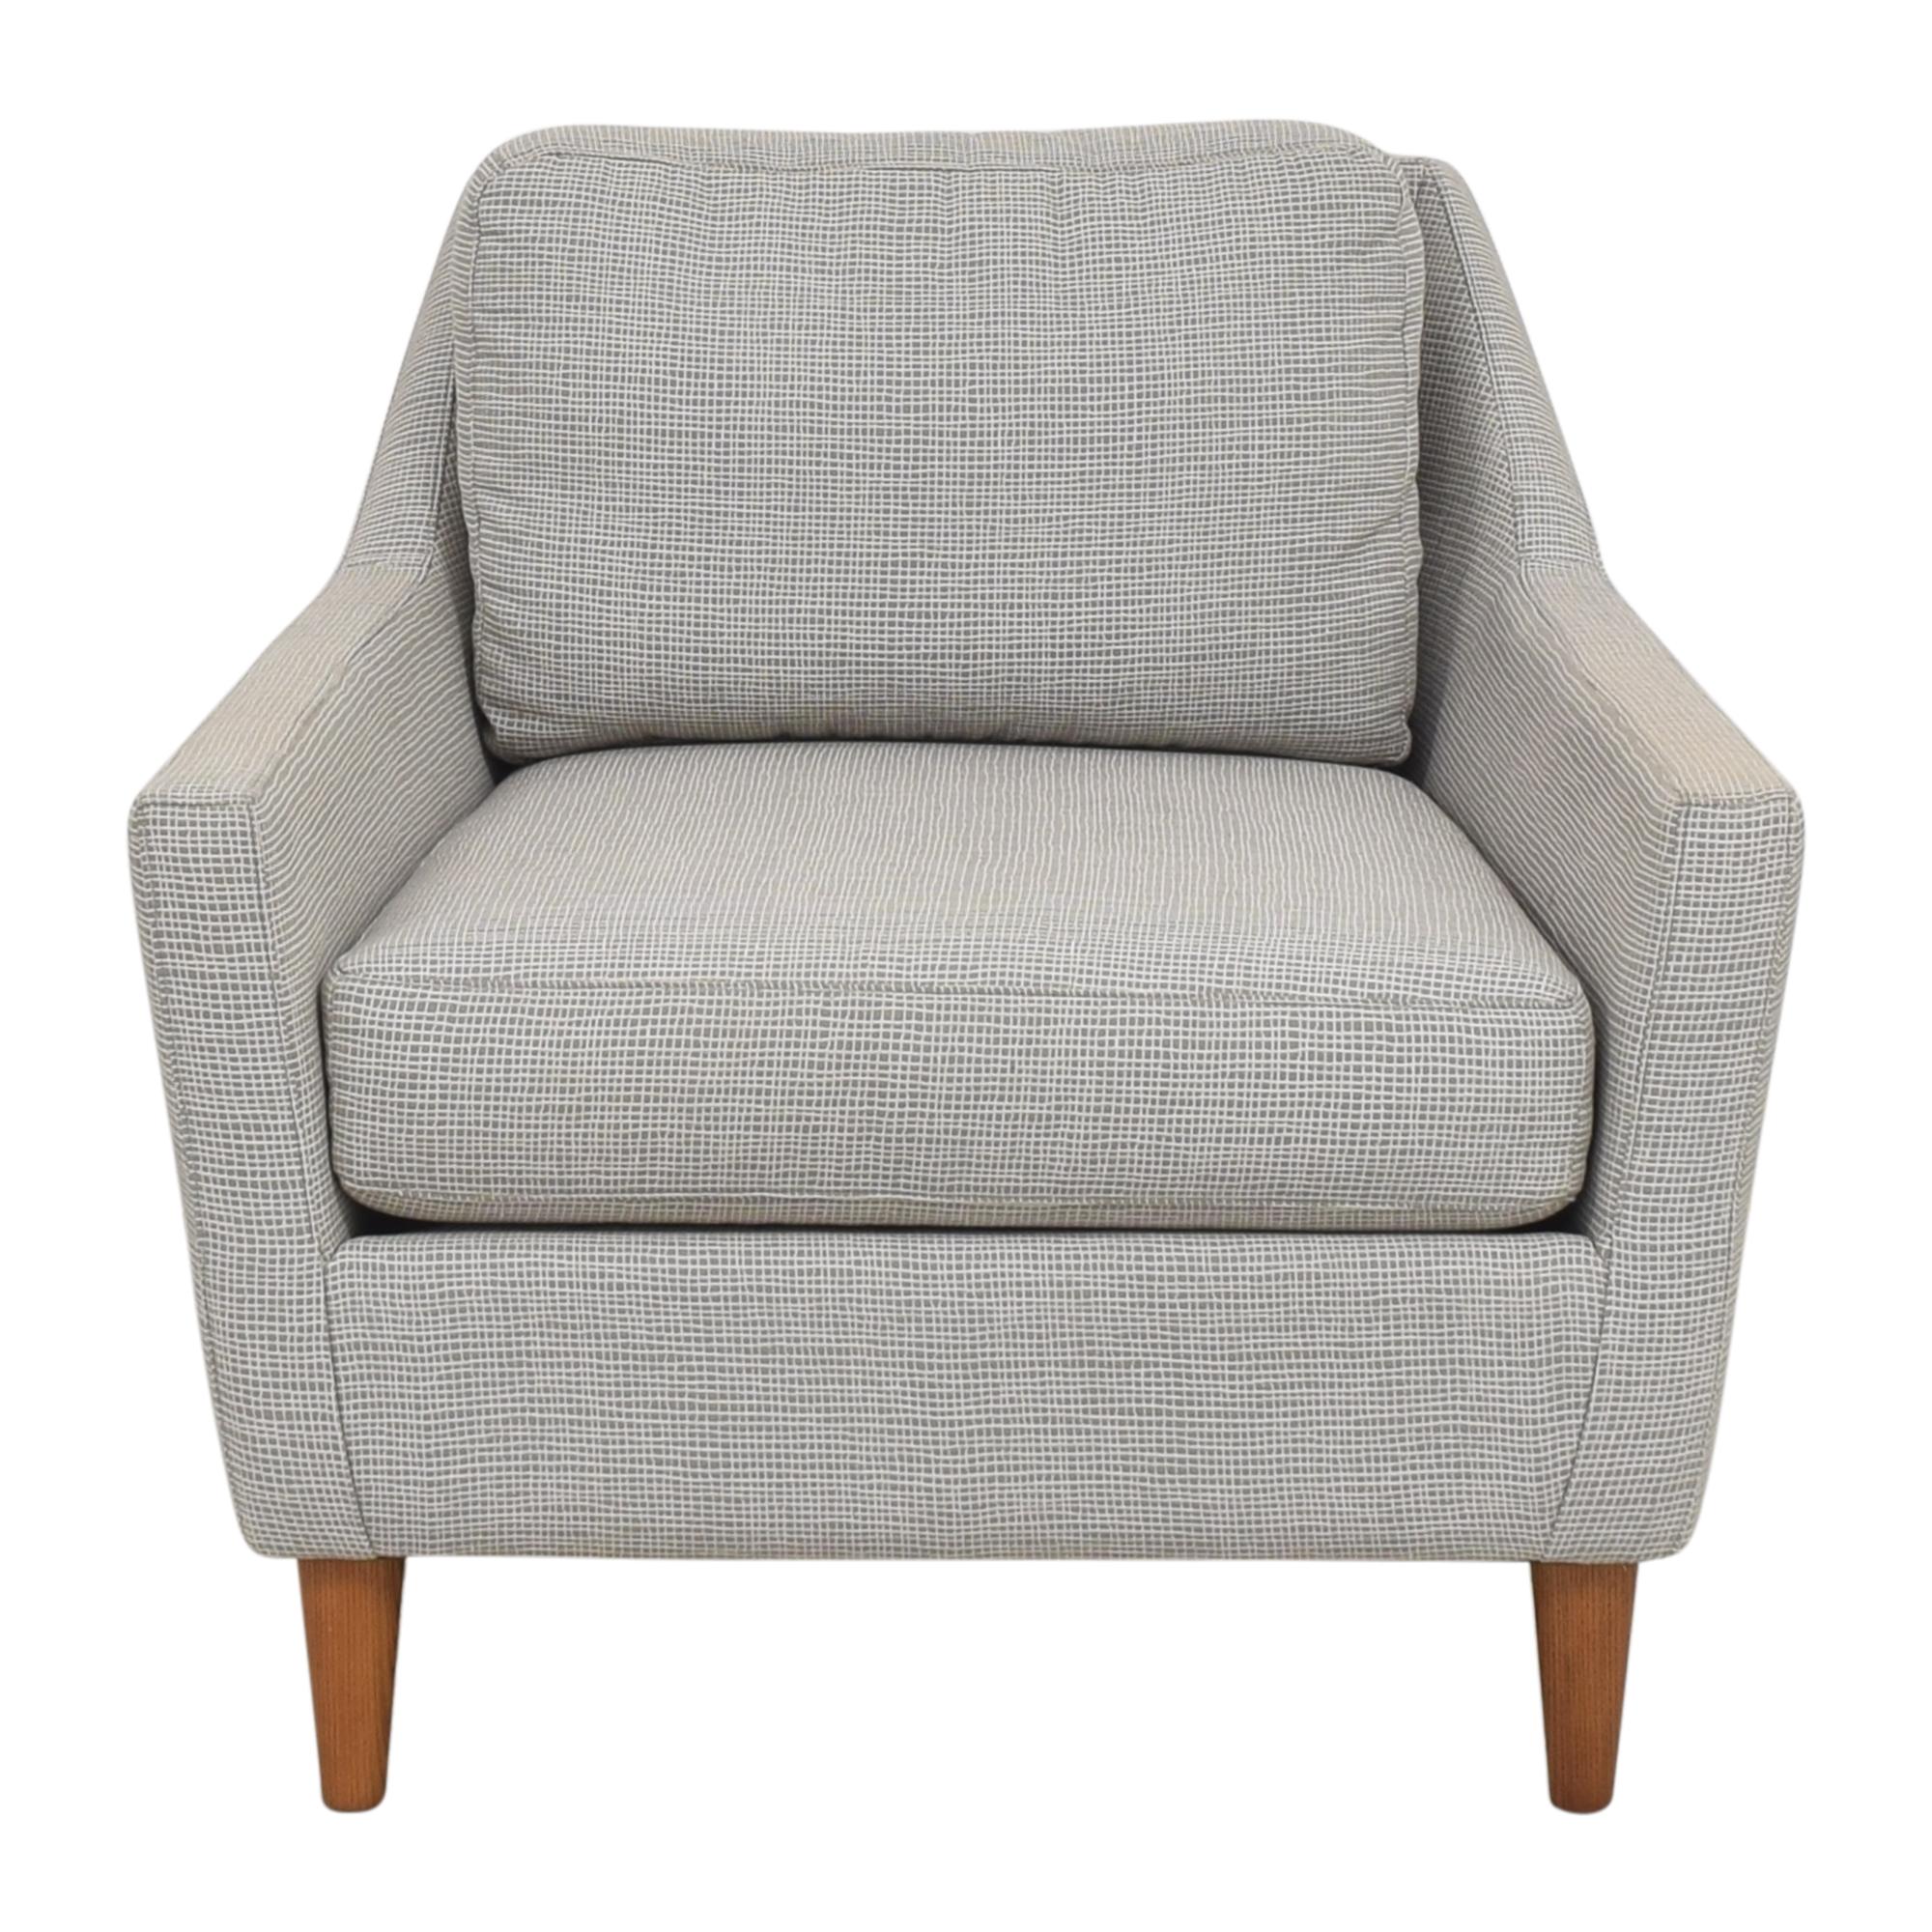 West Elm West Elm Everett Chair nyc